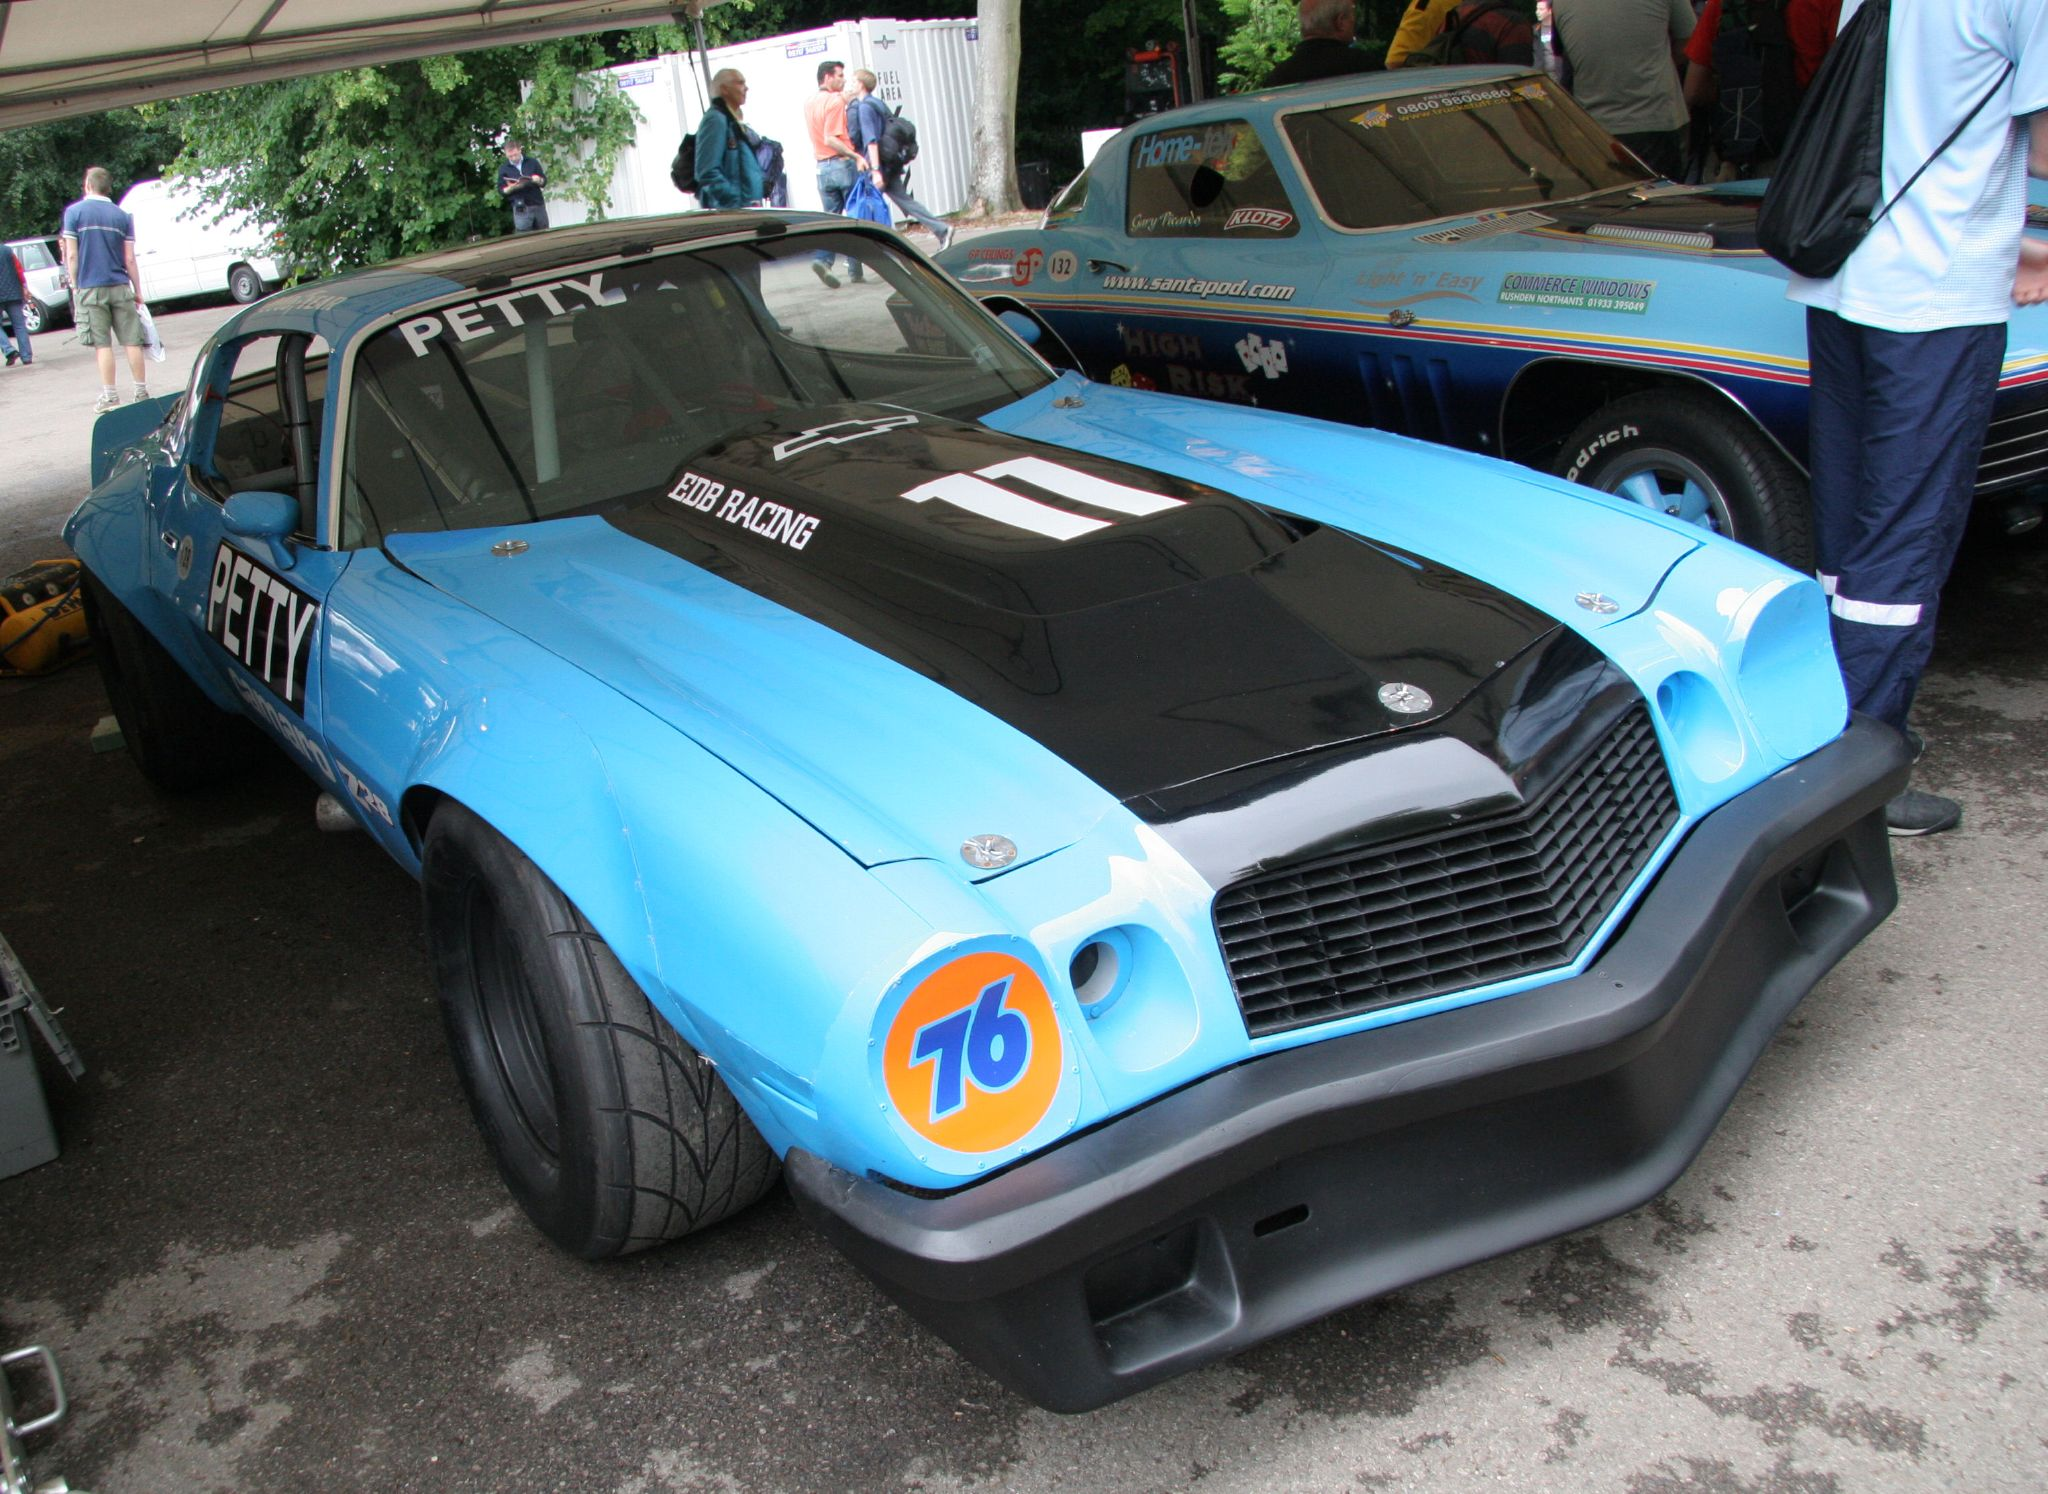 Iroc Z Wiki >> File:Chevrolet Camaro Z28 IROC 1977 - Flickr - exfordy.jpg